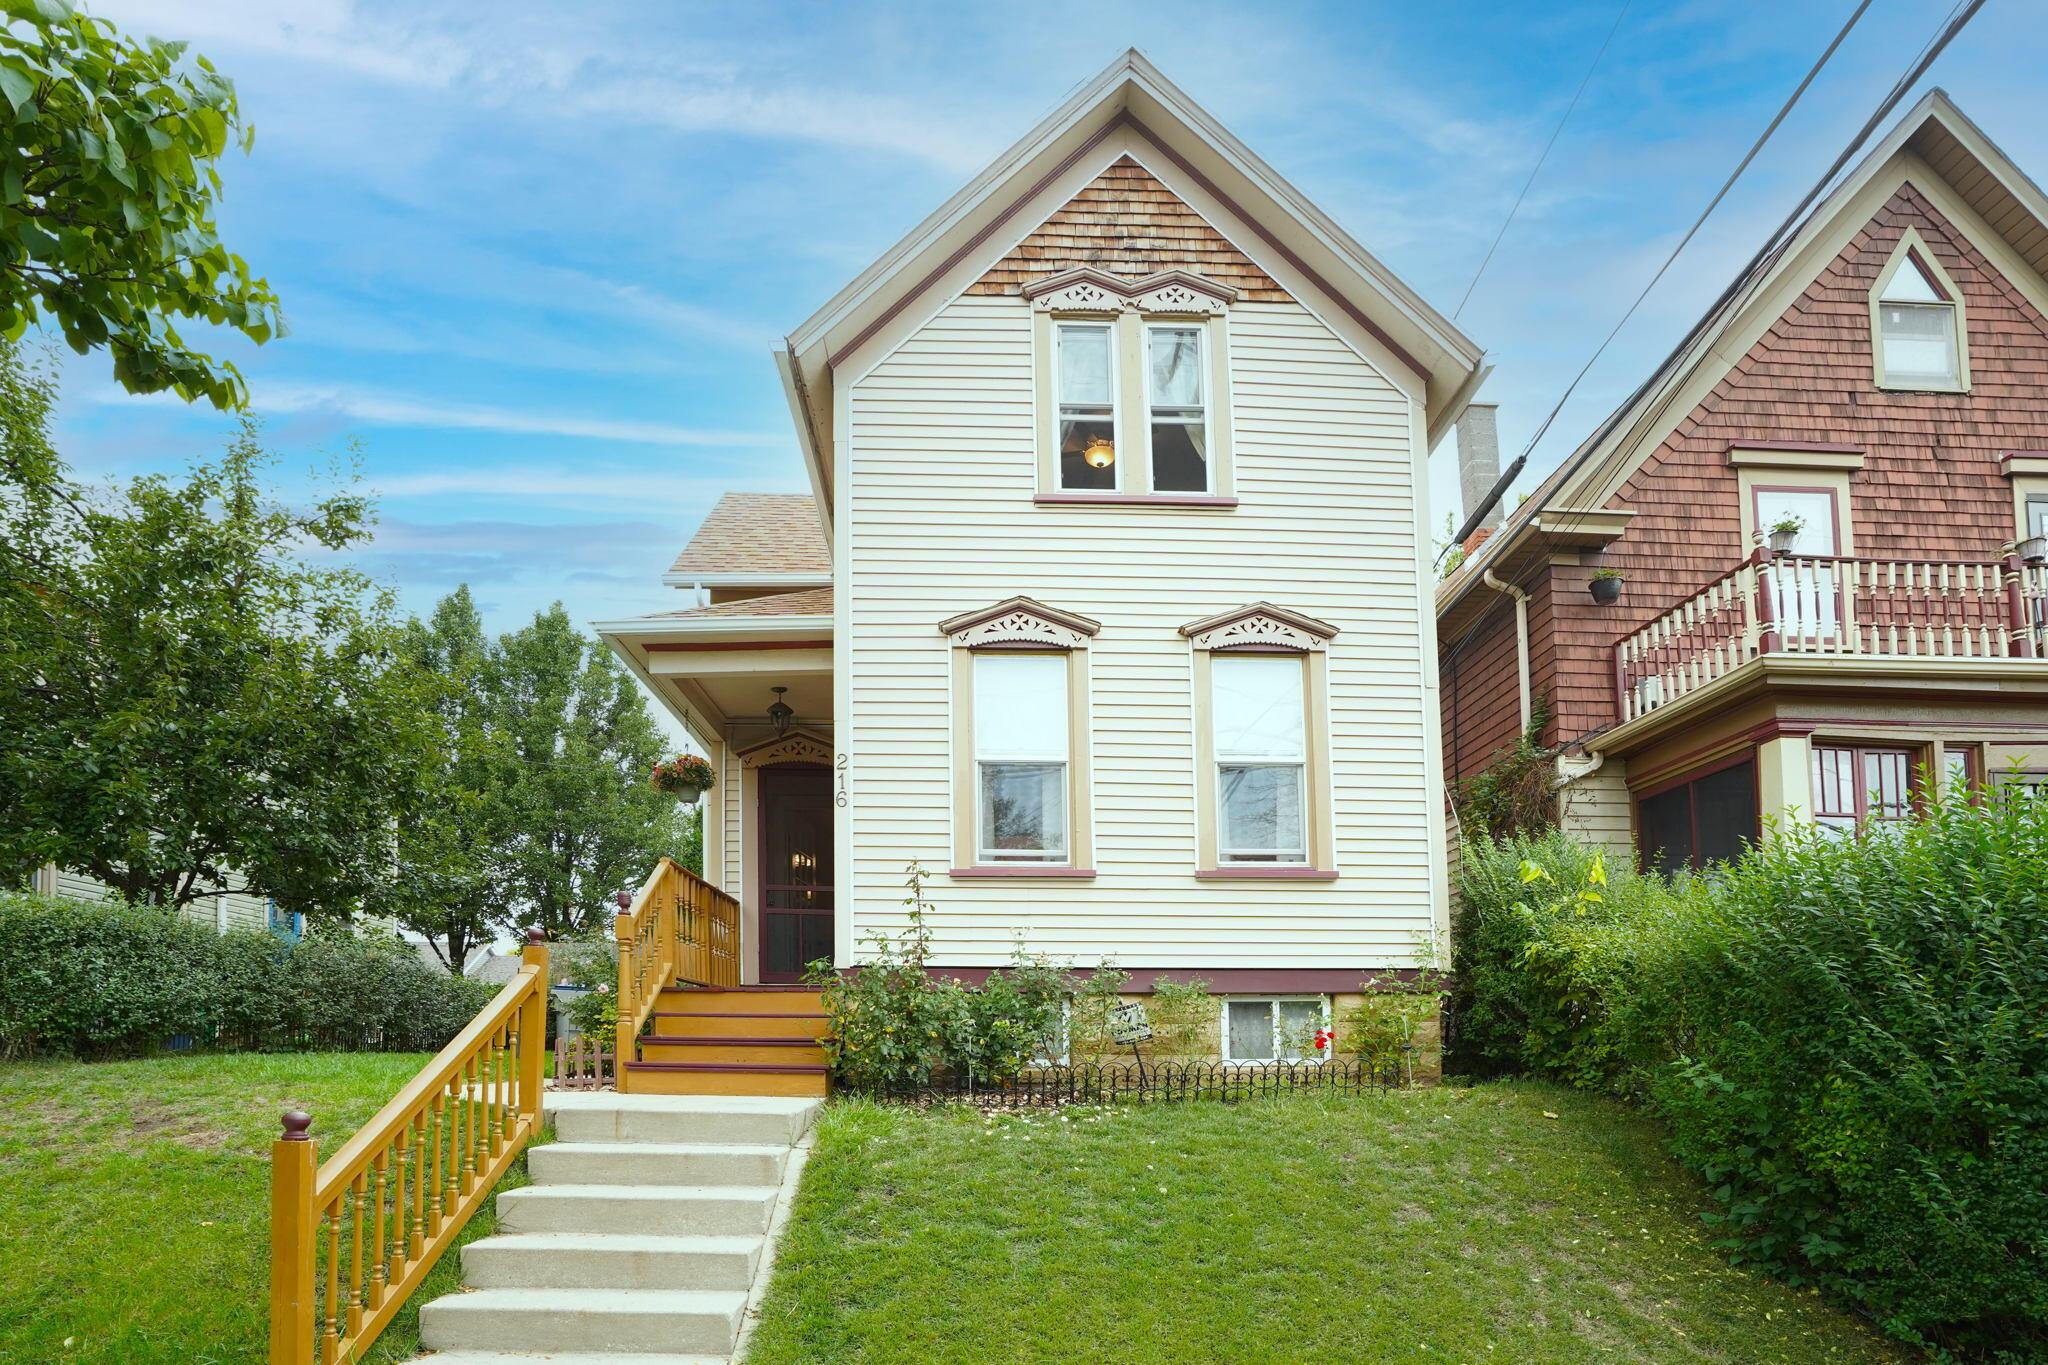 216 Garfield Ave, Milwaukee, Wisconsin 53212, 3 Bedrooms Bedrooms, 7 Rooms Rooms,1 BathroomBathrooms,Single-Family,For Sale,Garfield Ave,1768211